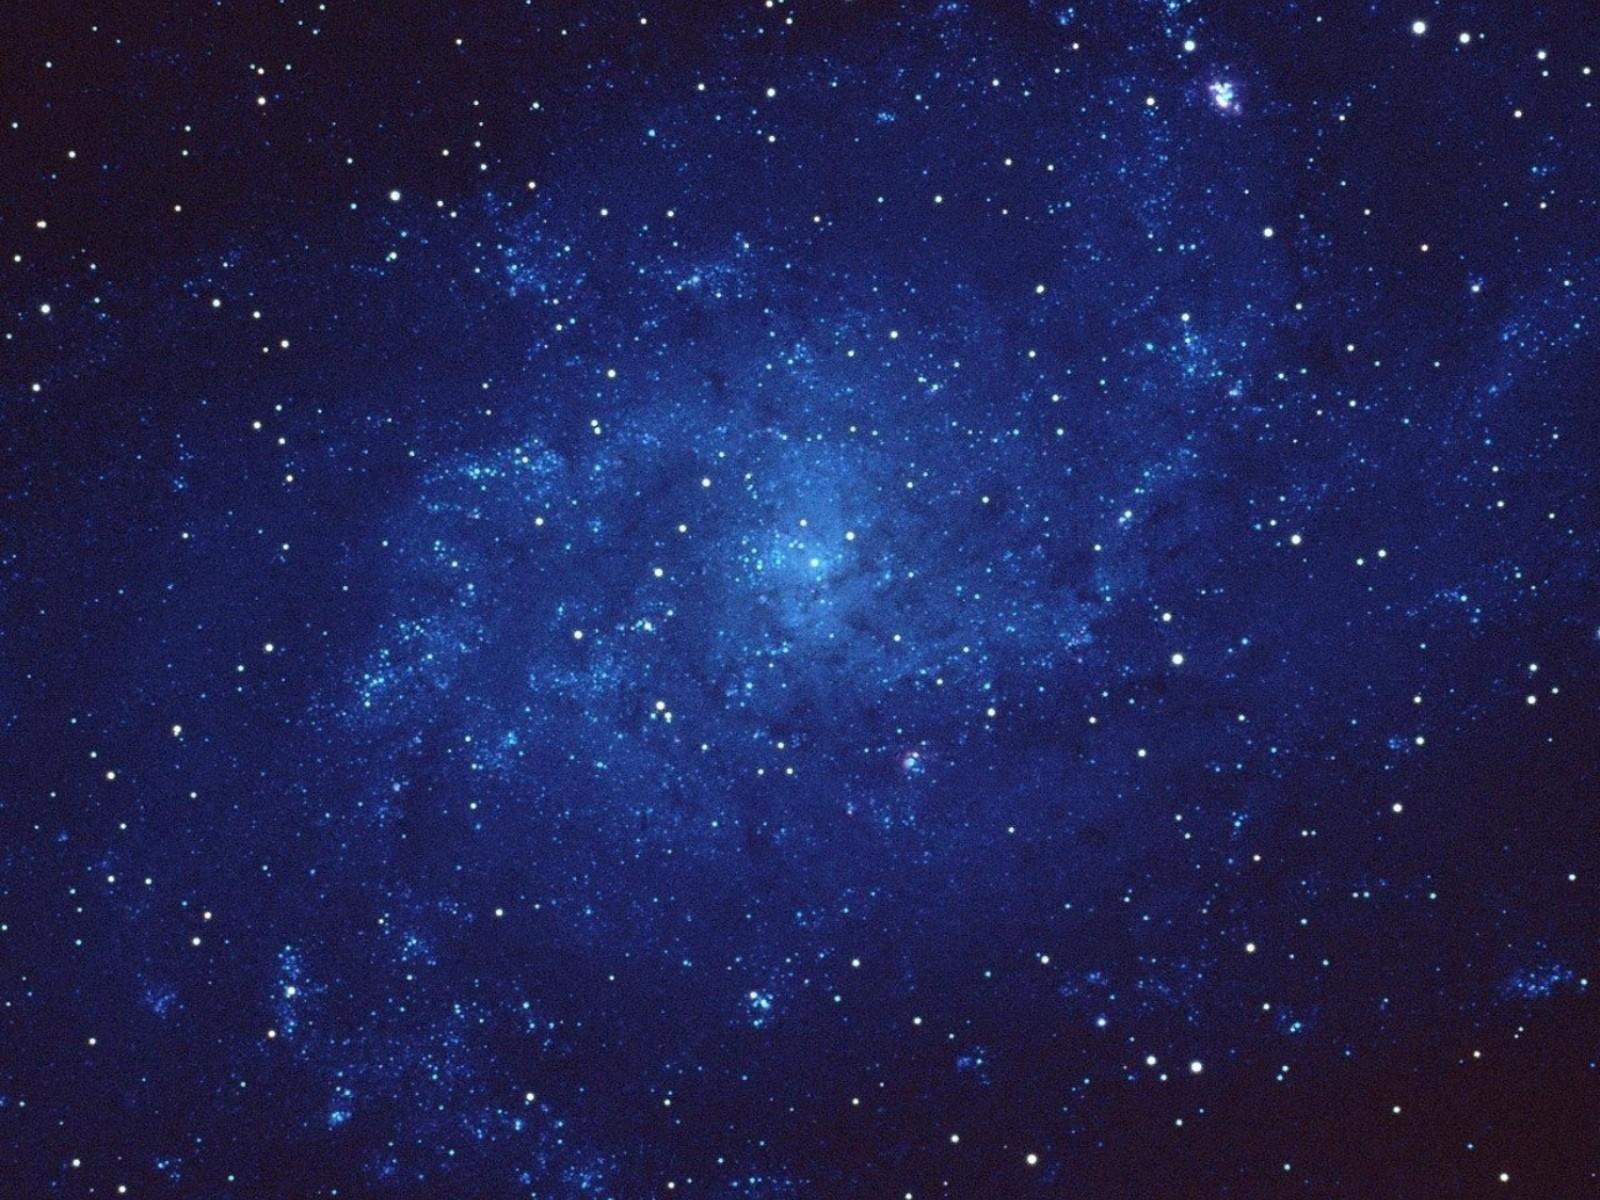 44 Sky Full Of Stars Wallpaper On Wallpapersafari